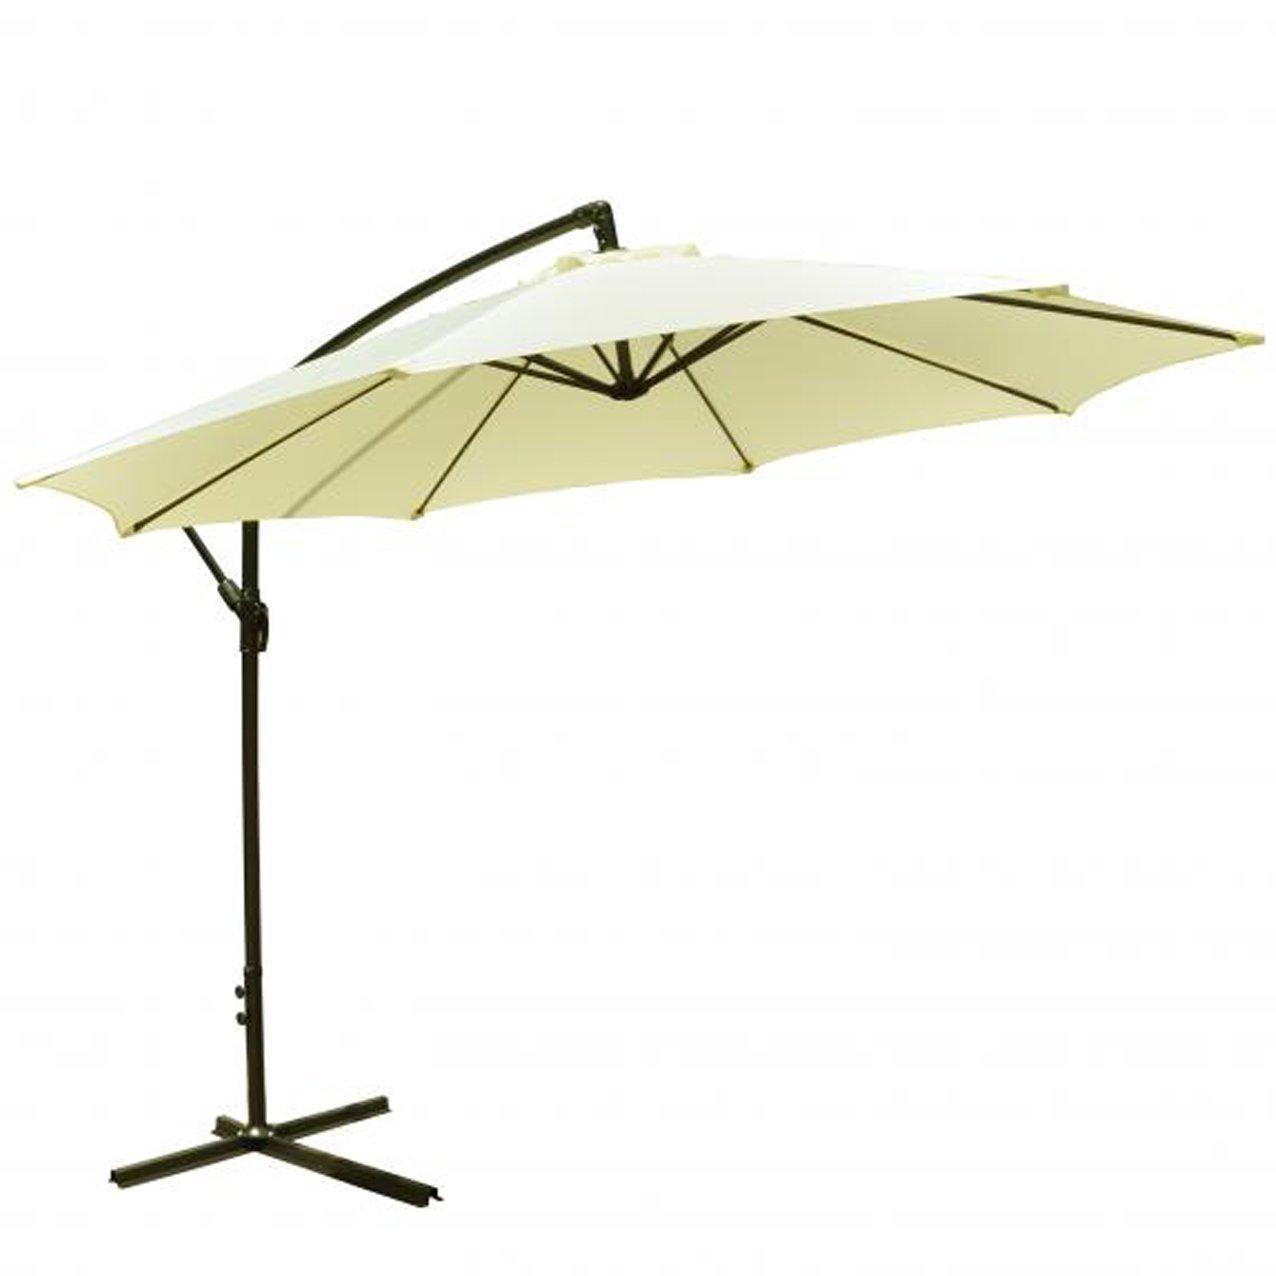 MR Direct Patio Umbrella Offset 10 Hanging Umbrella Outdoor Market Umbrella D10 Beige